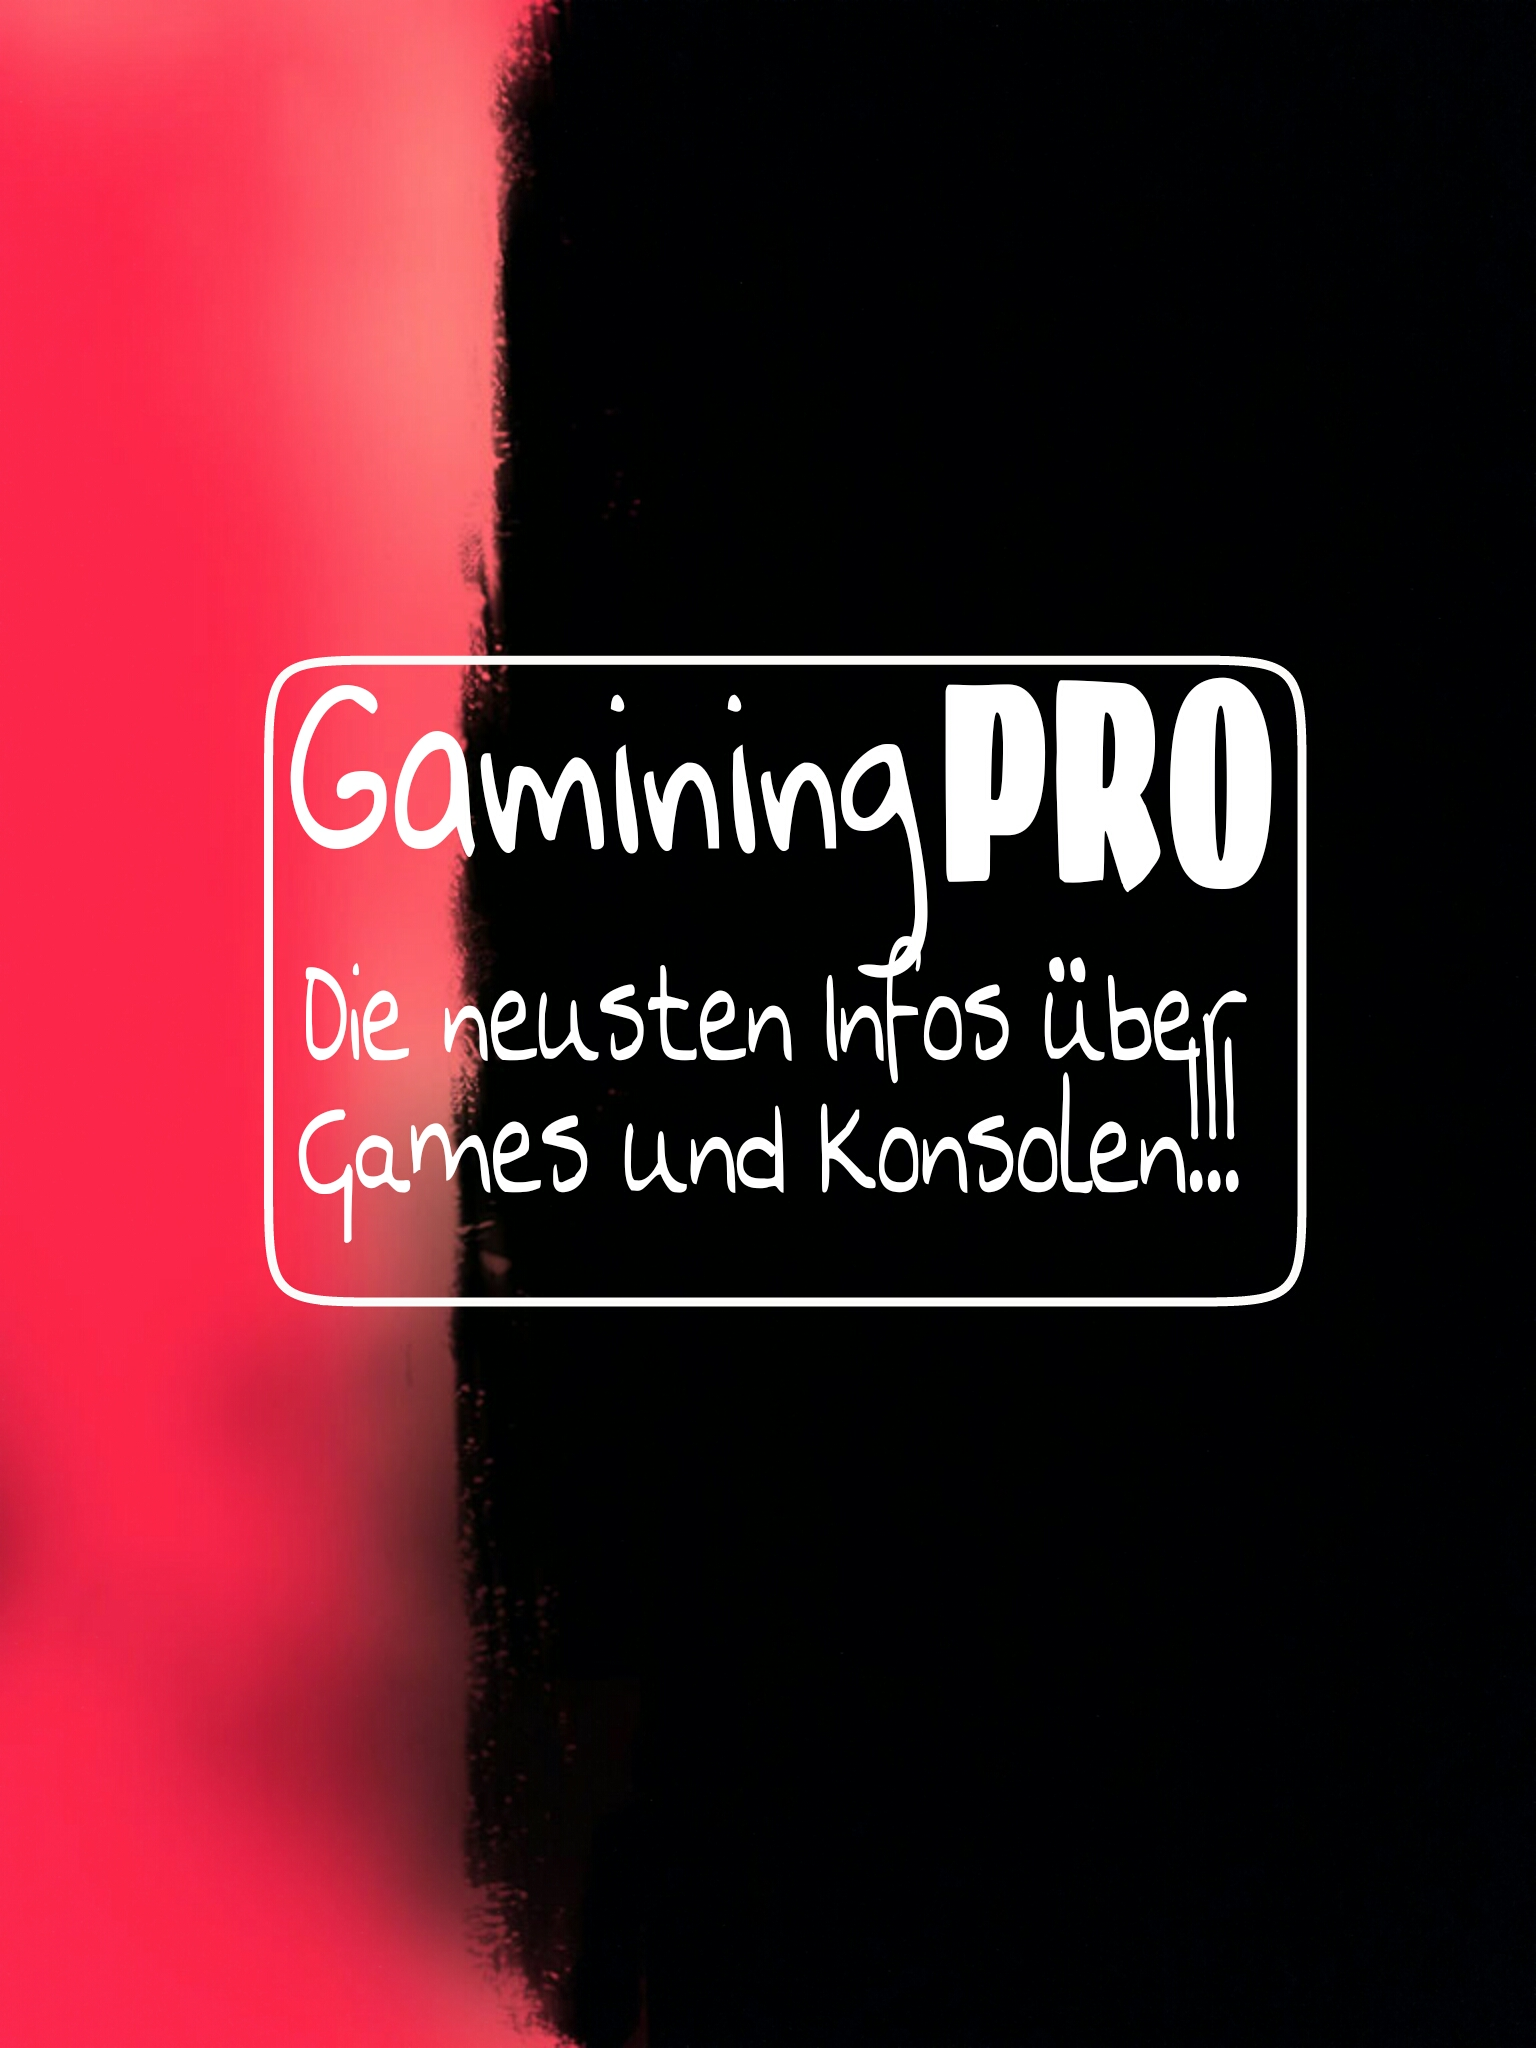 Gaming PRO - Magazine cover